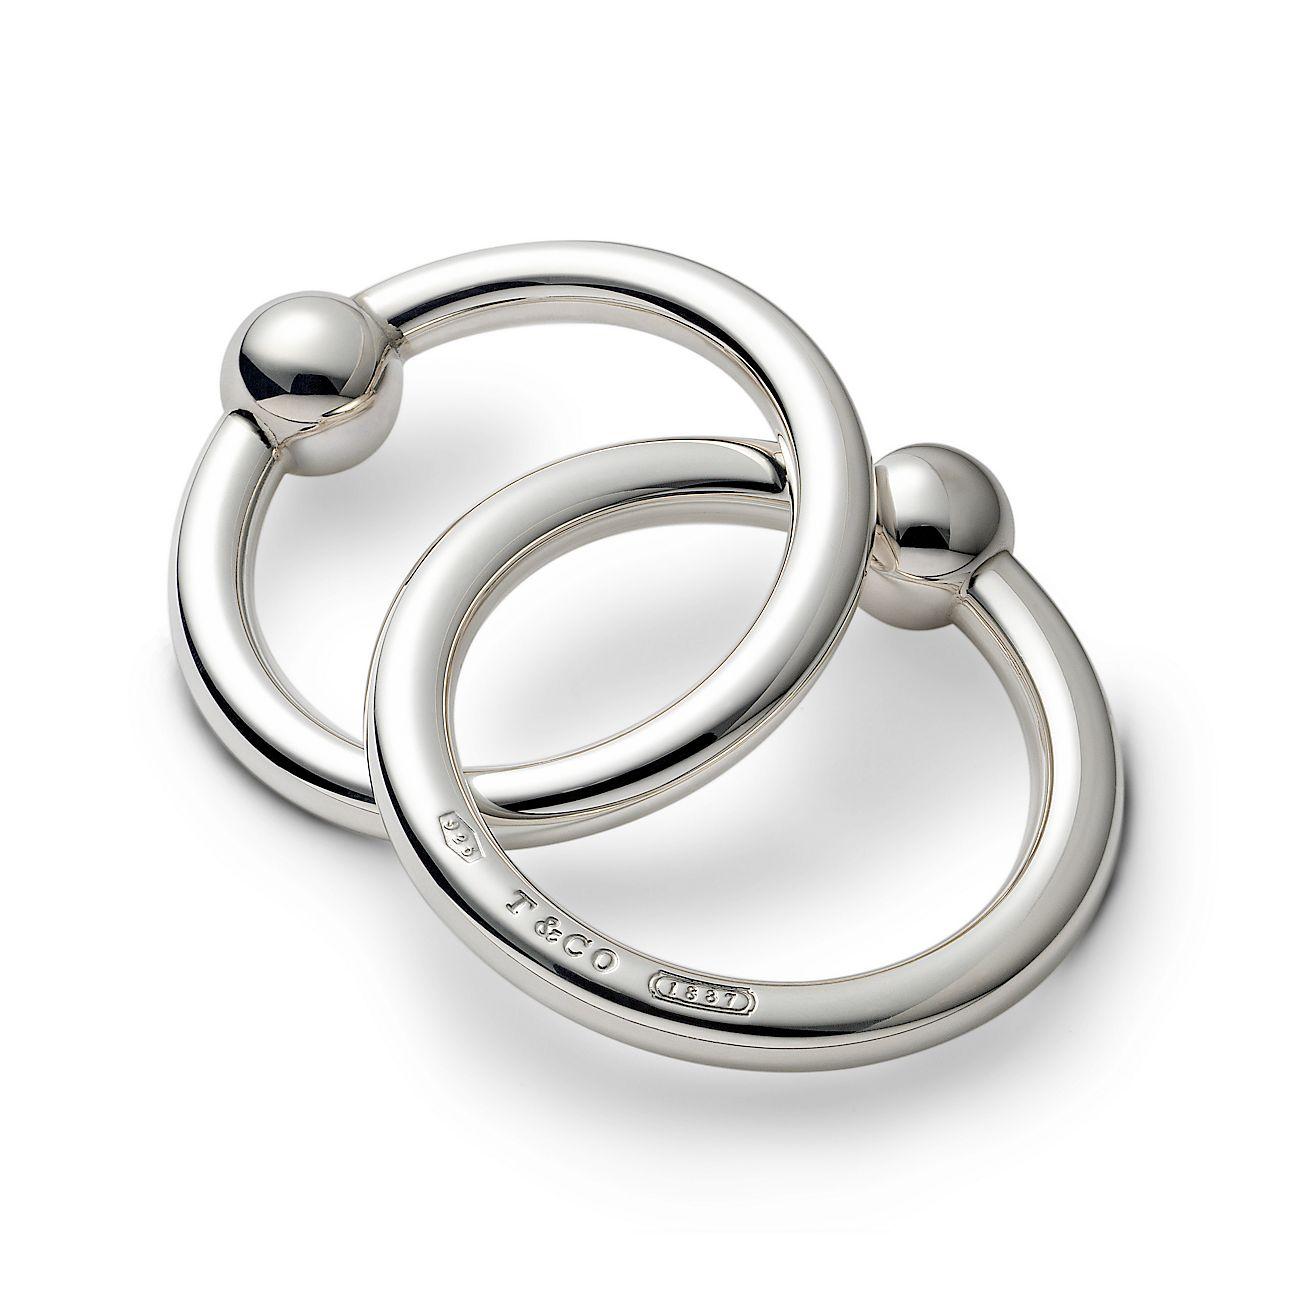 1837 teething ring rattle in sterling